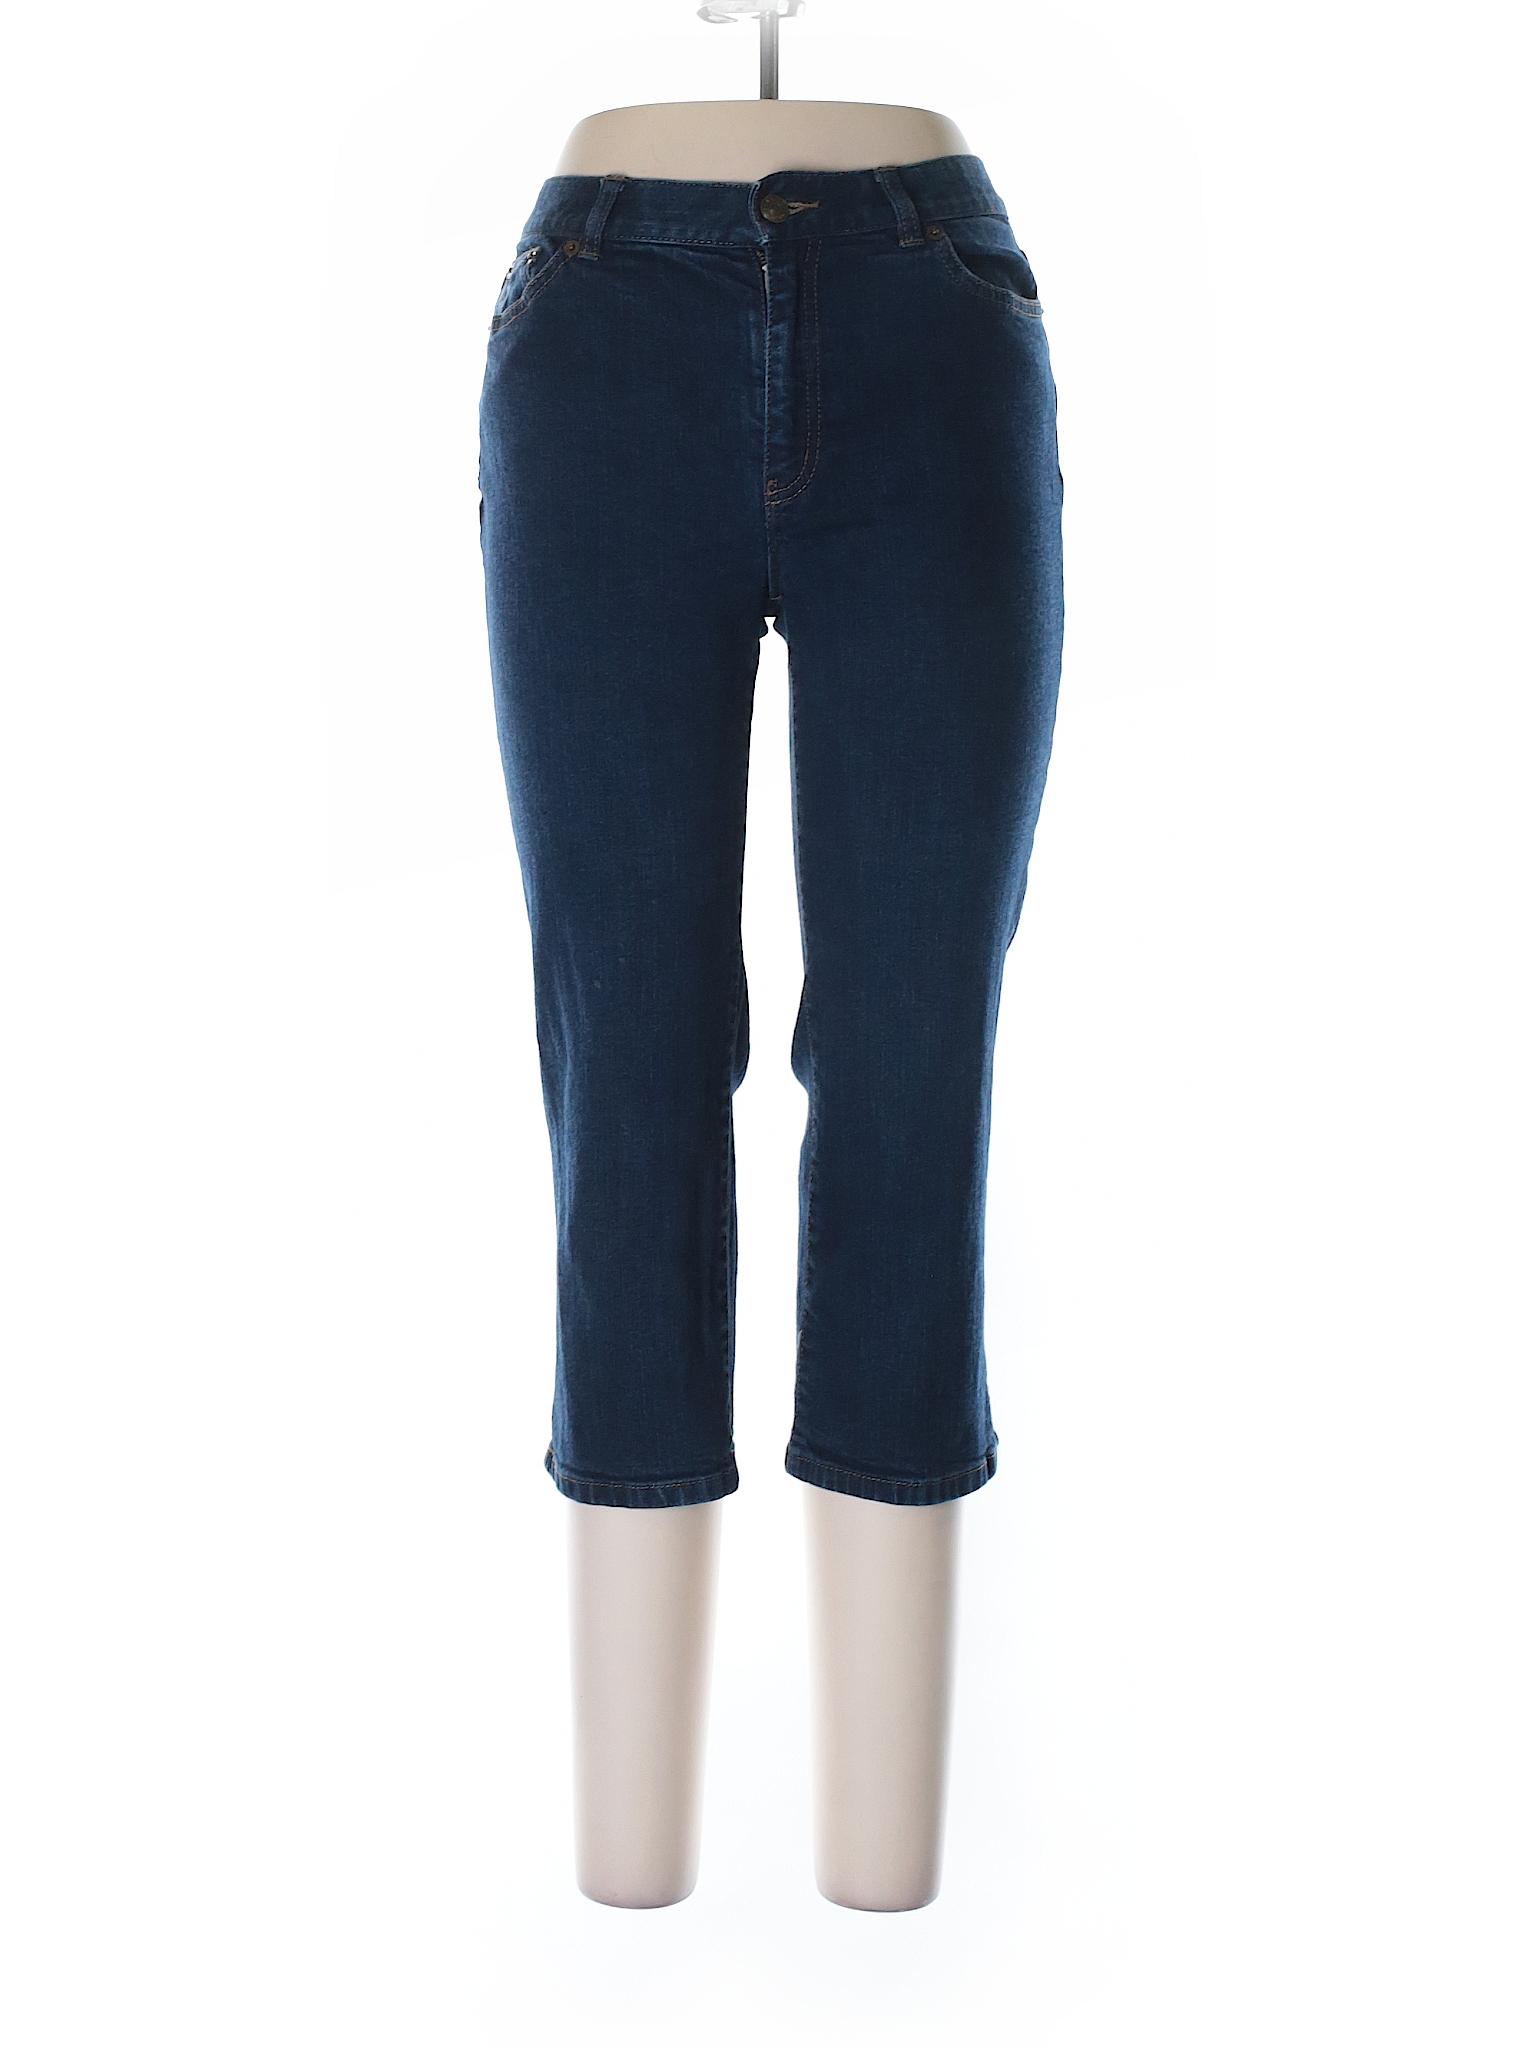 Promotion Promotion Jeans dAe9tvVEBp Lauren dAe9tvVEBp Jeans Lauren BrxBa